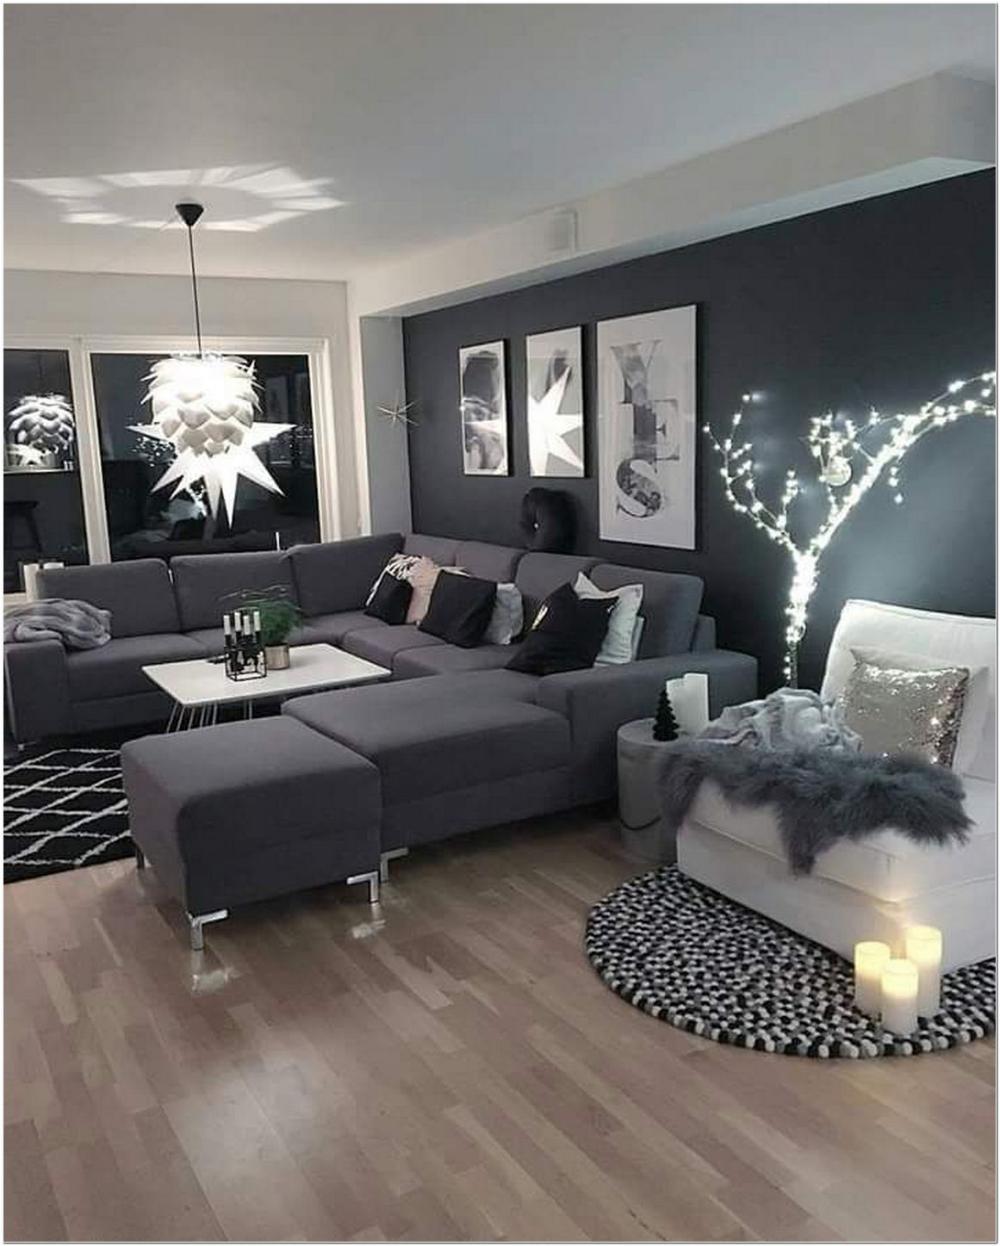 75 Luxurious Modern Living Room Decor Ideas 19 In 2020 B